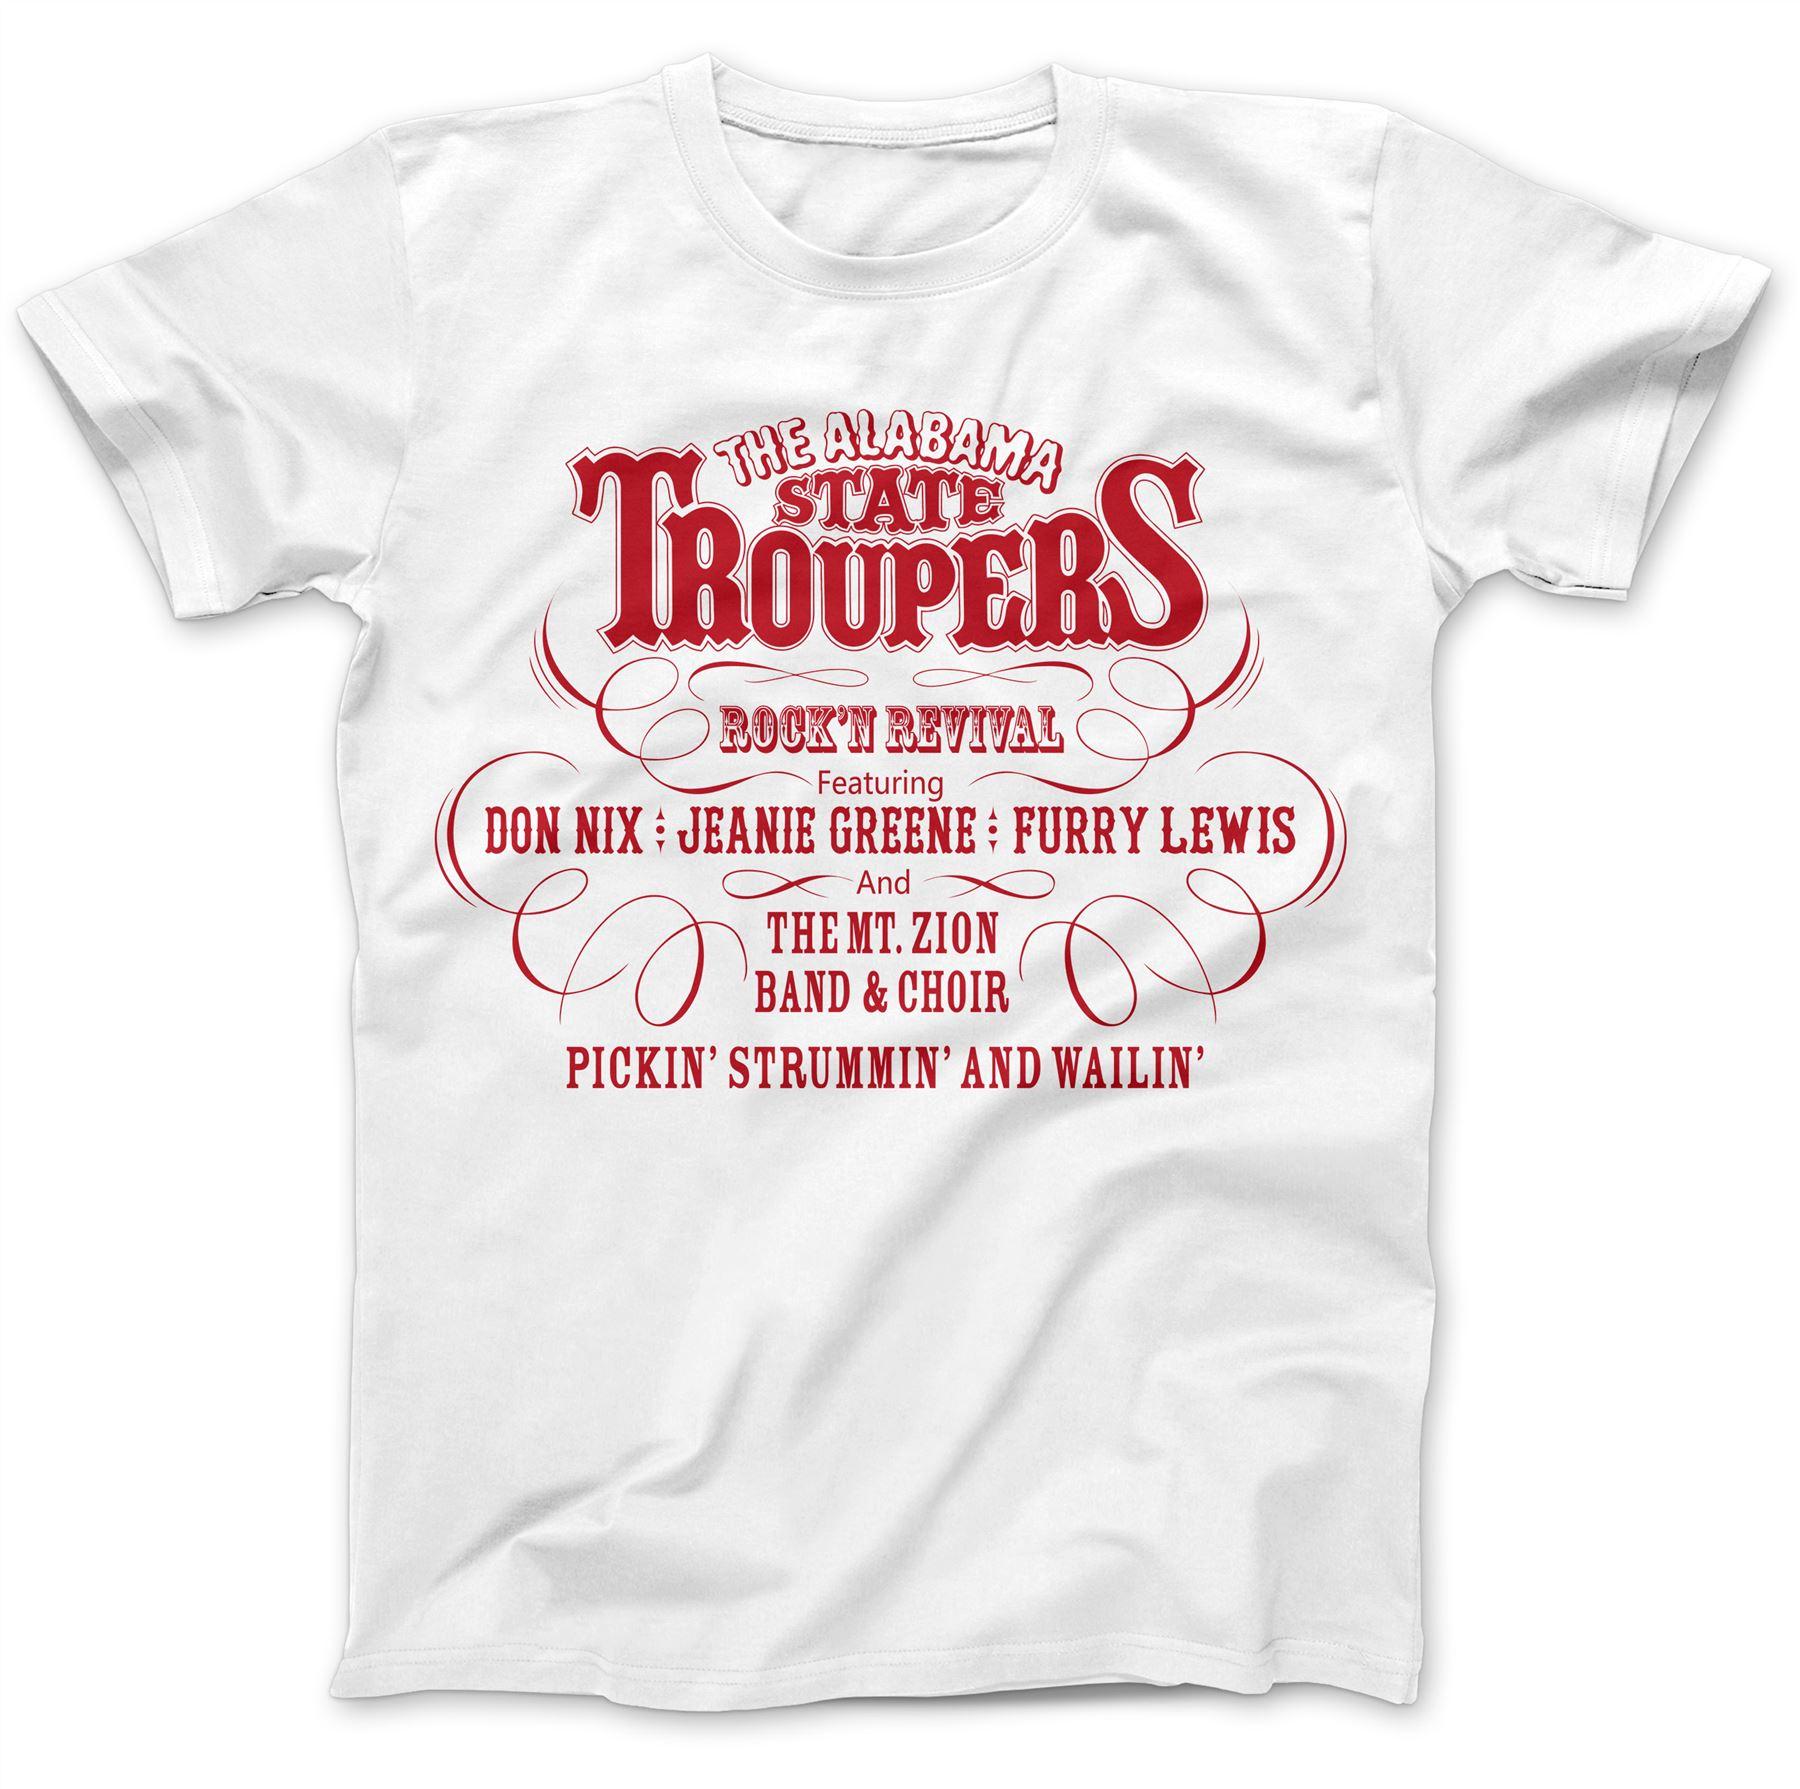 Estado de Alabama Troupers Camiseta 100/% Algodón Premium Usado Por John Paul Jones